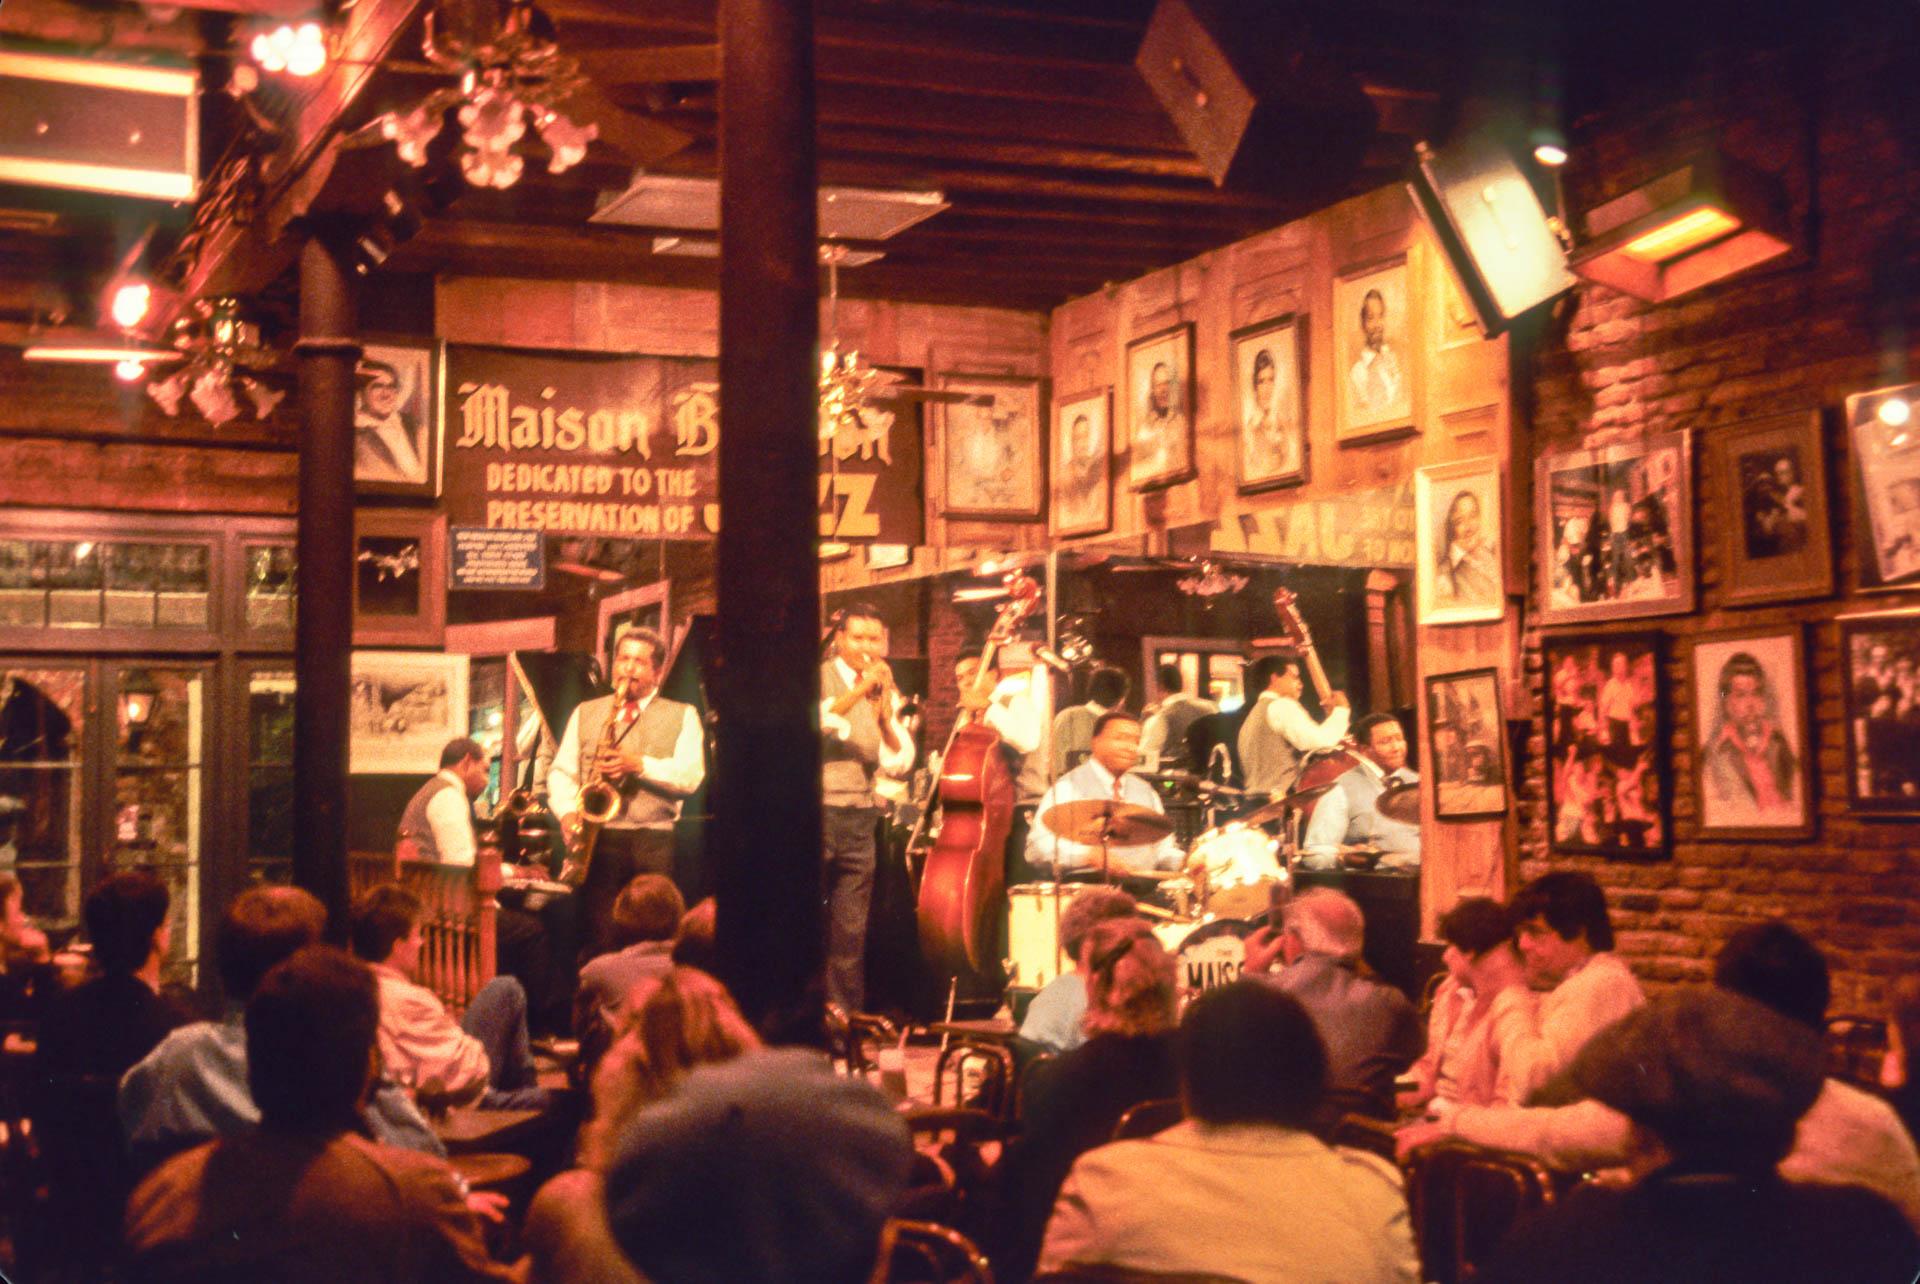 Jazz club, New Orleans, 1987